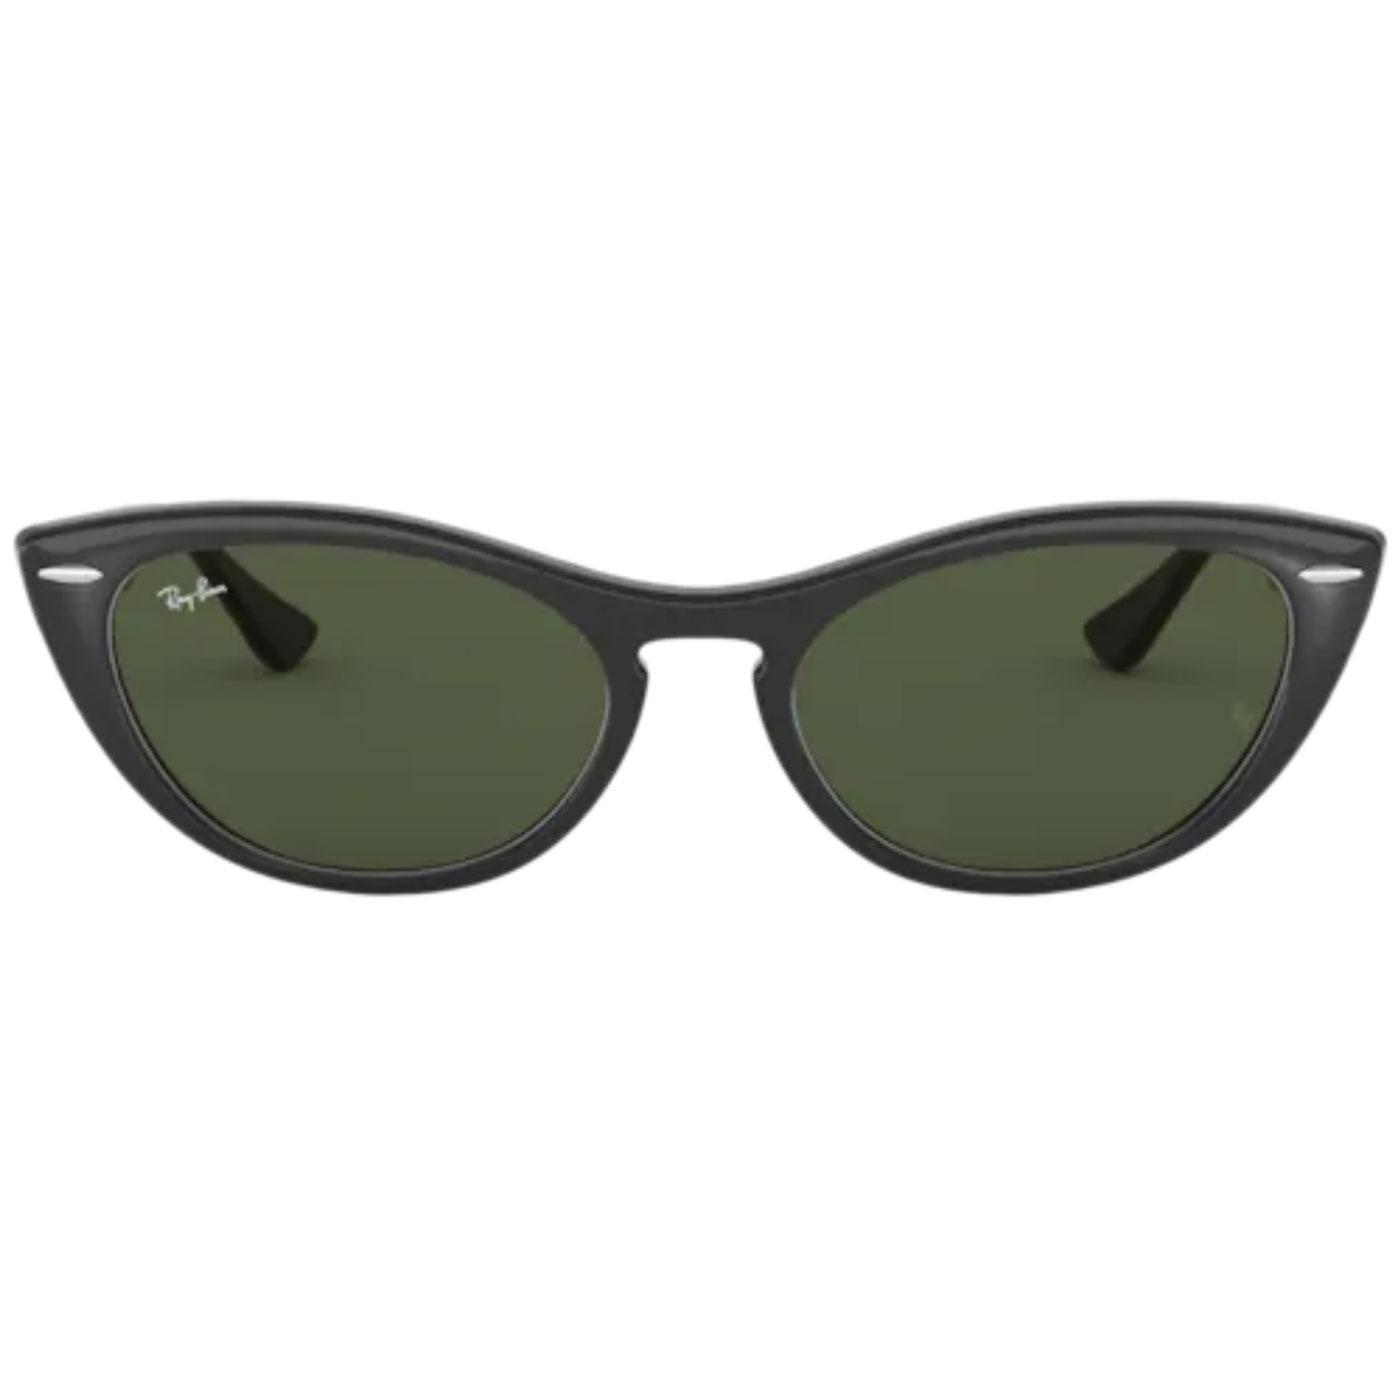 Nina RAY-BAN Women's Retro 60s Catseye Sunglasses